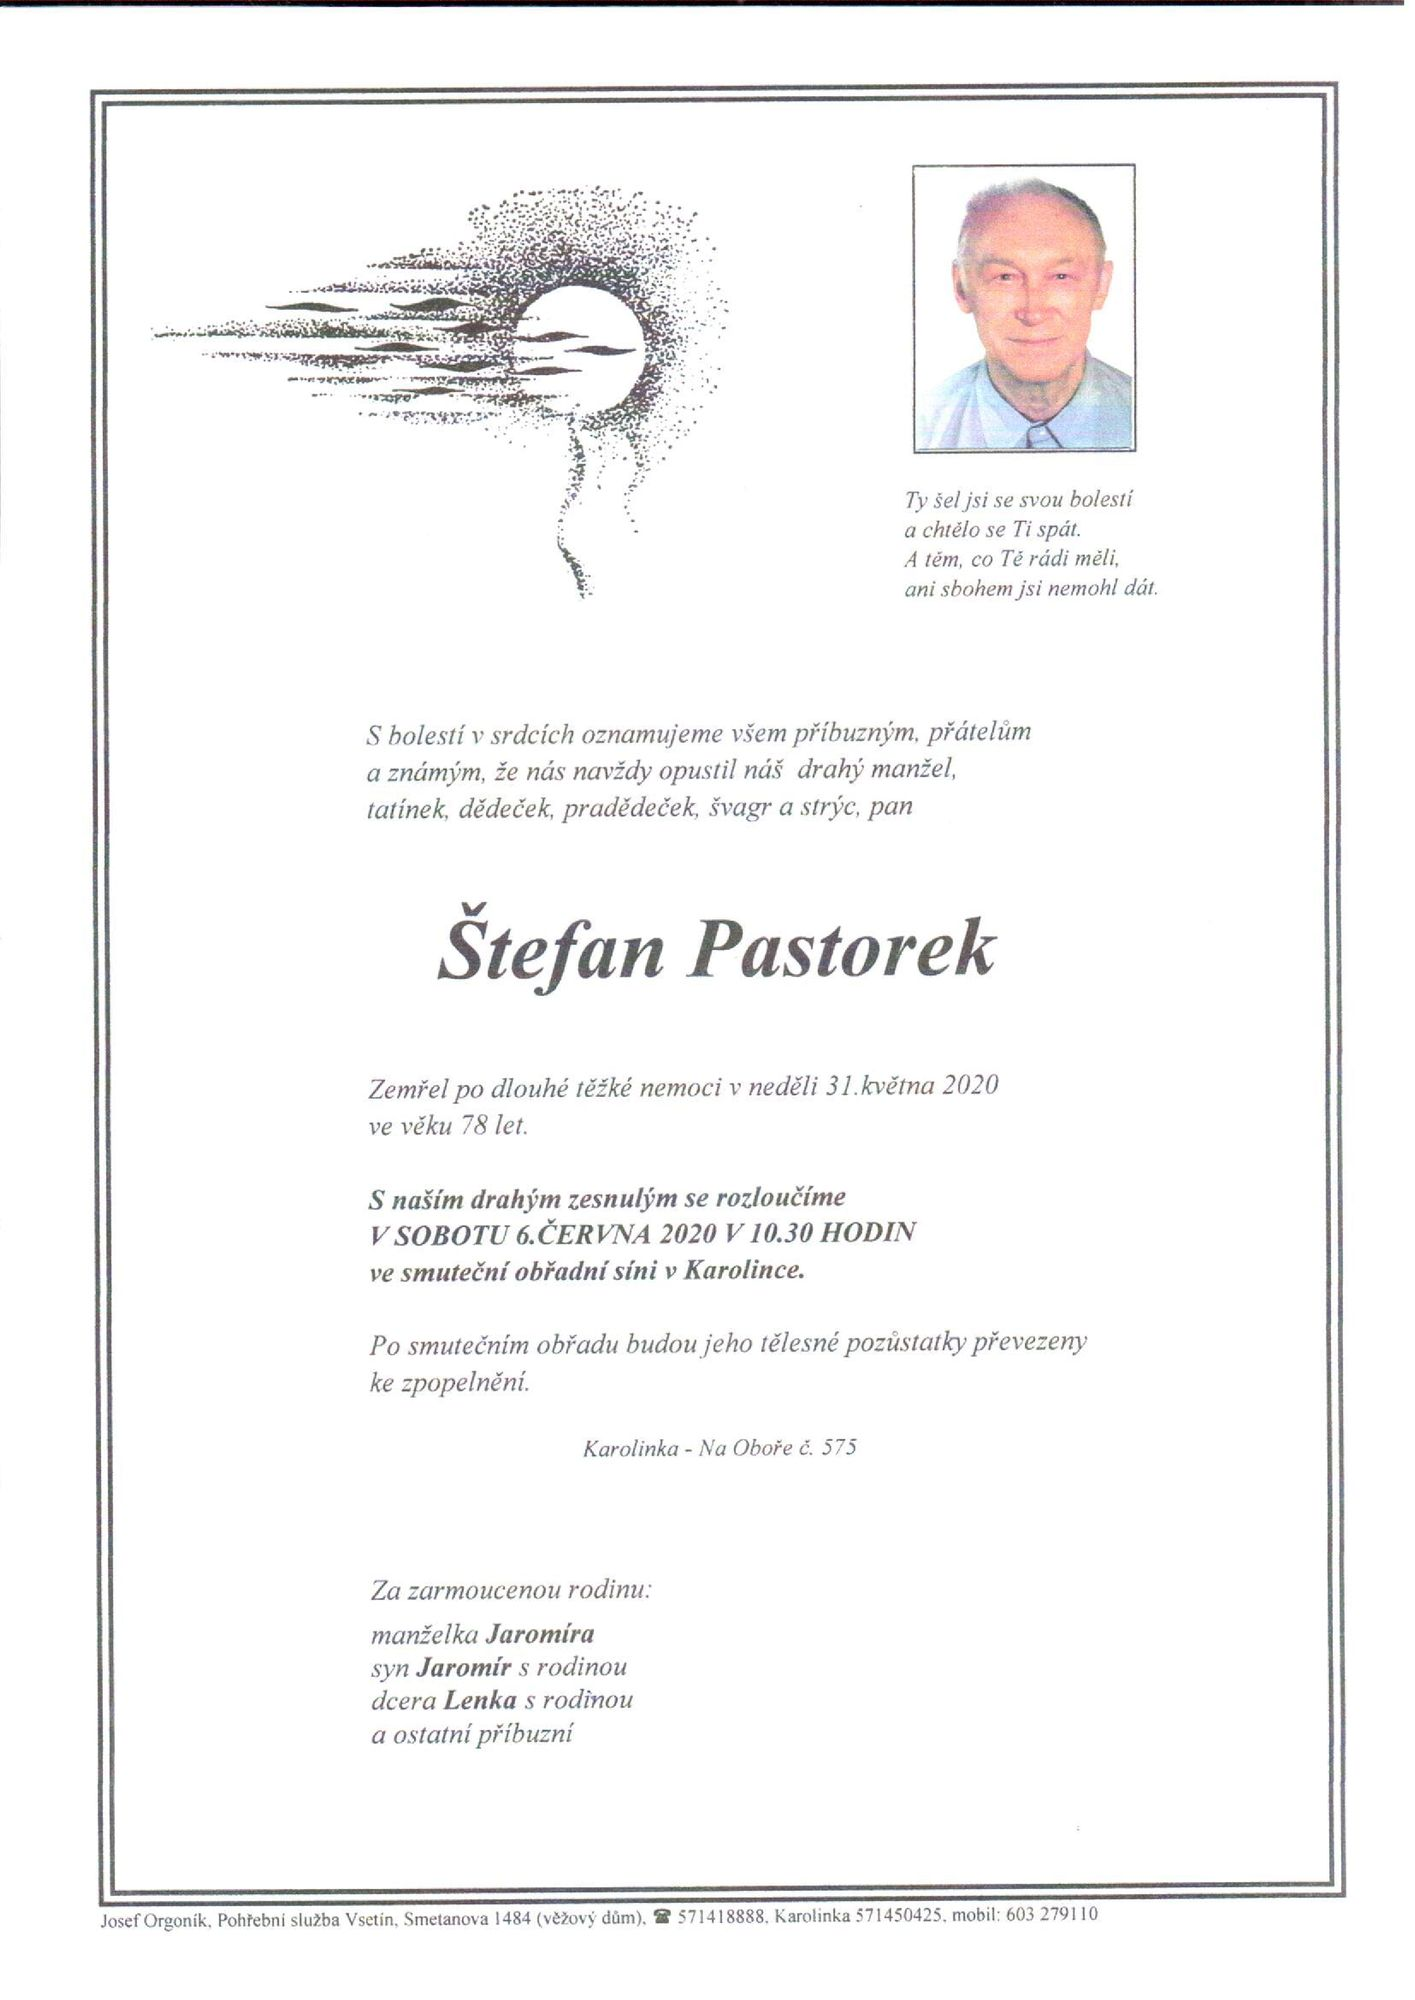 Štefan Pastorek